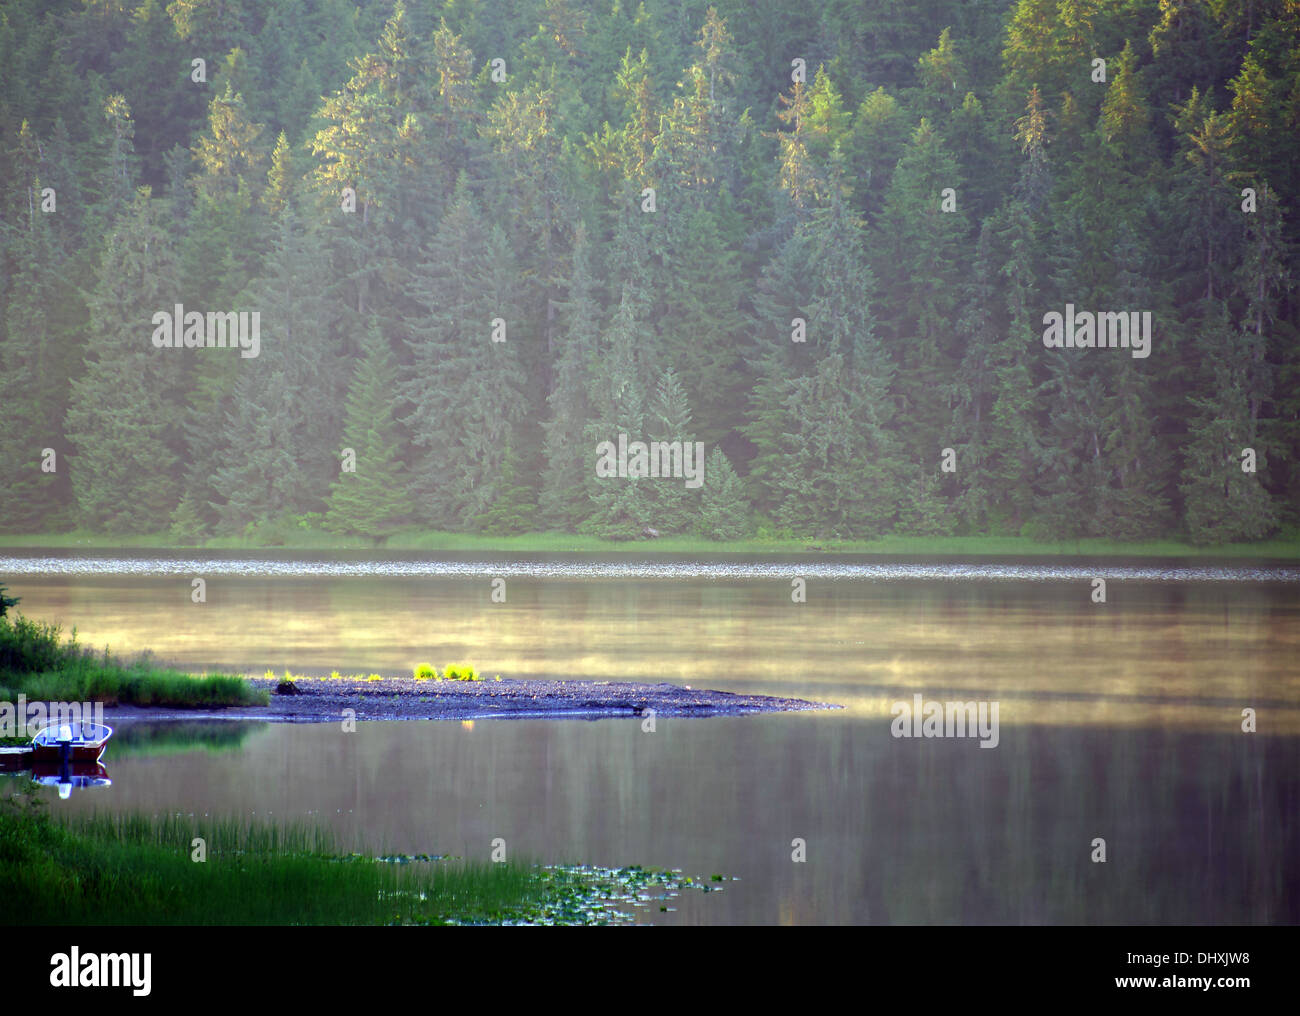 mendenhall lake - Stock Image